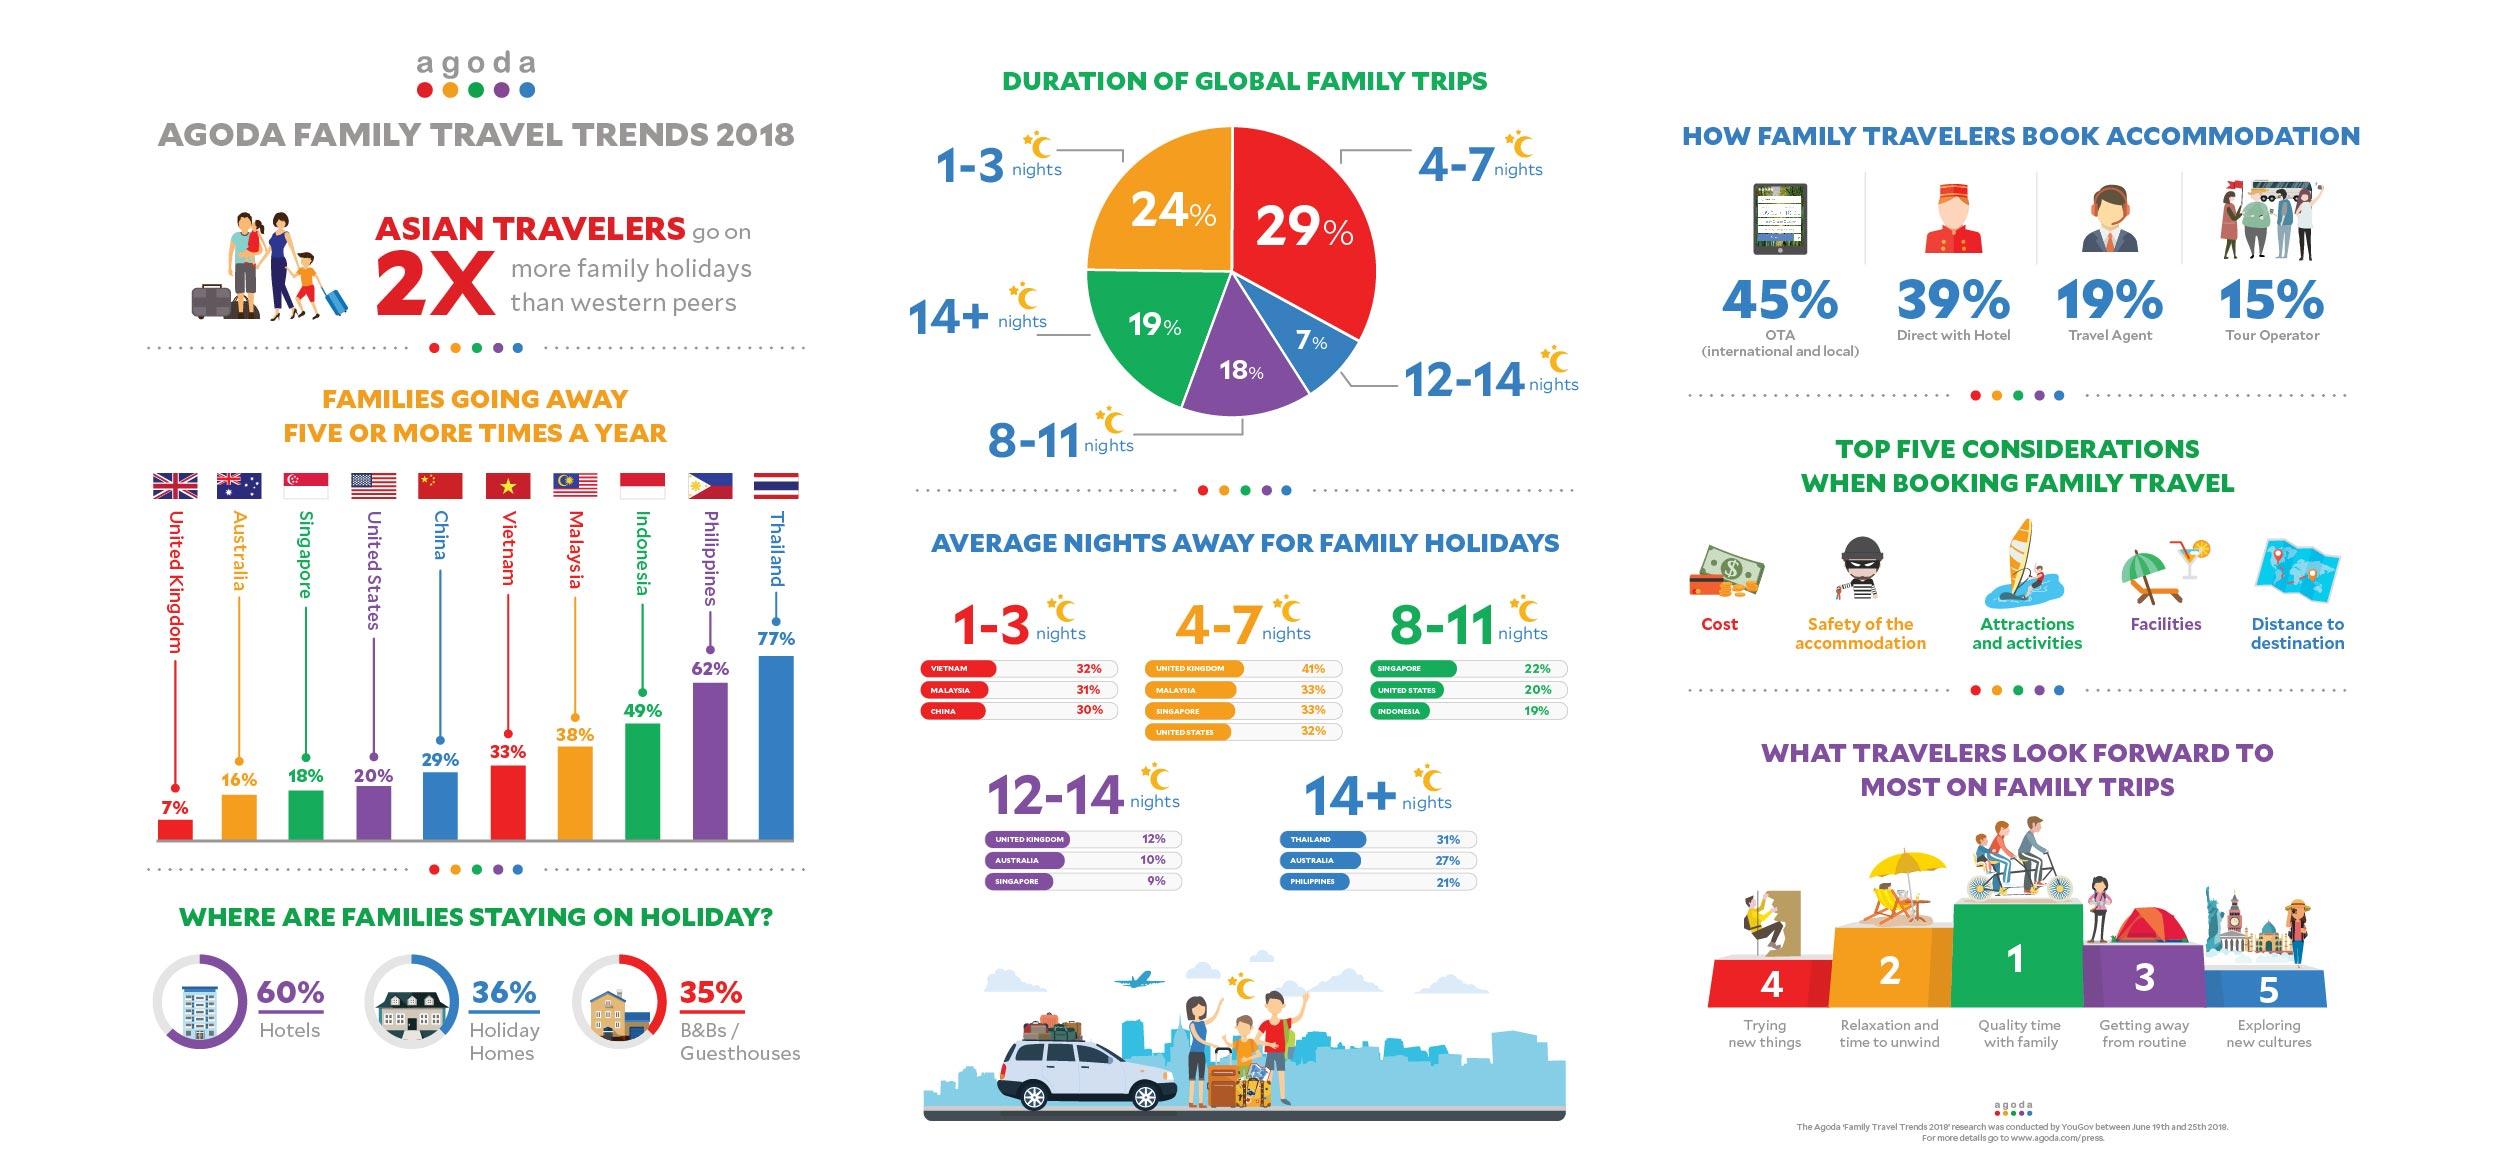 Agoda:亚洲旅行者正引领2018年家庭游趋势